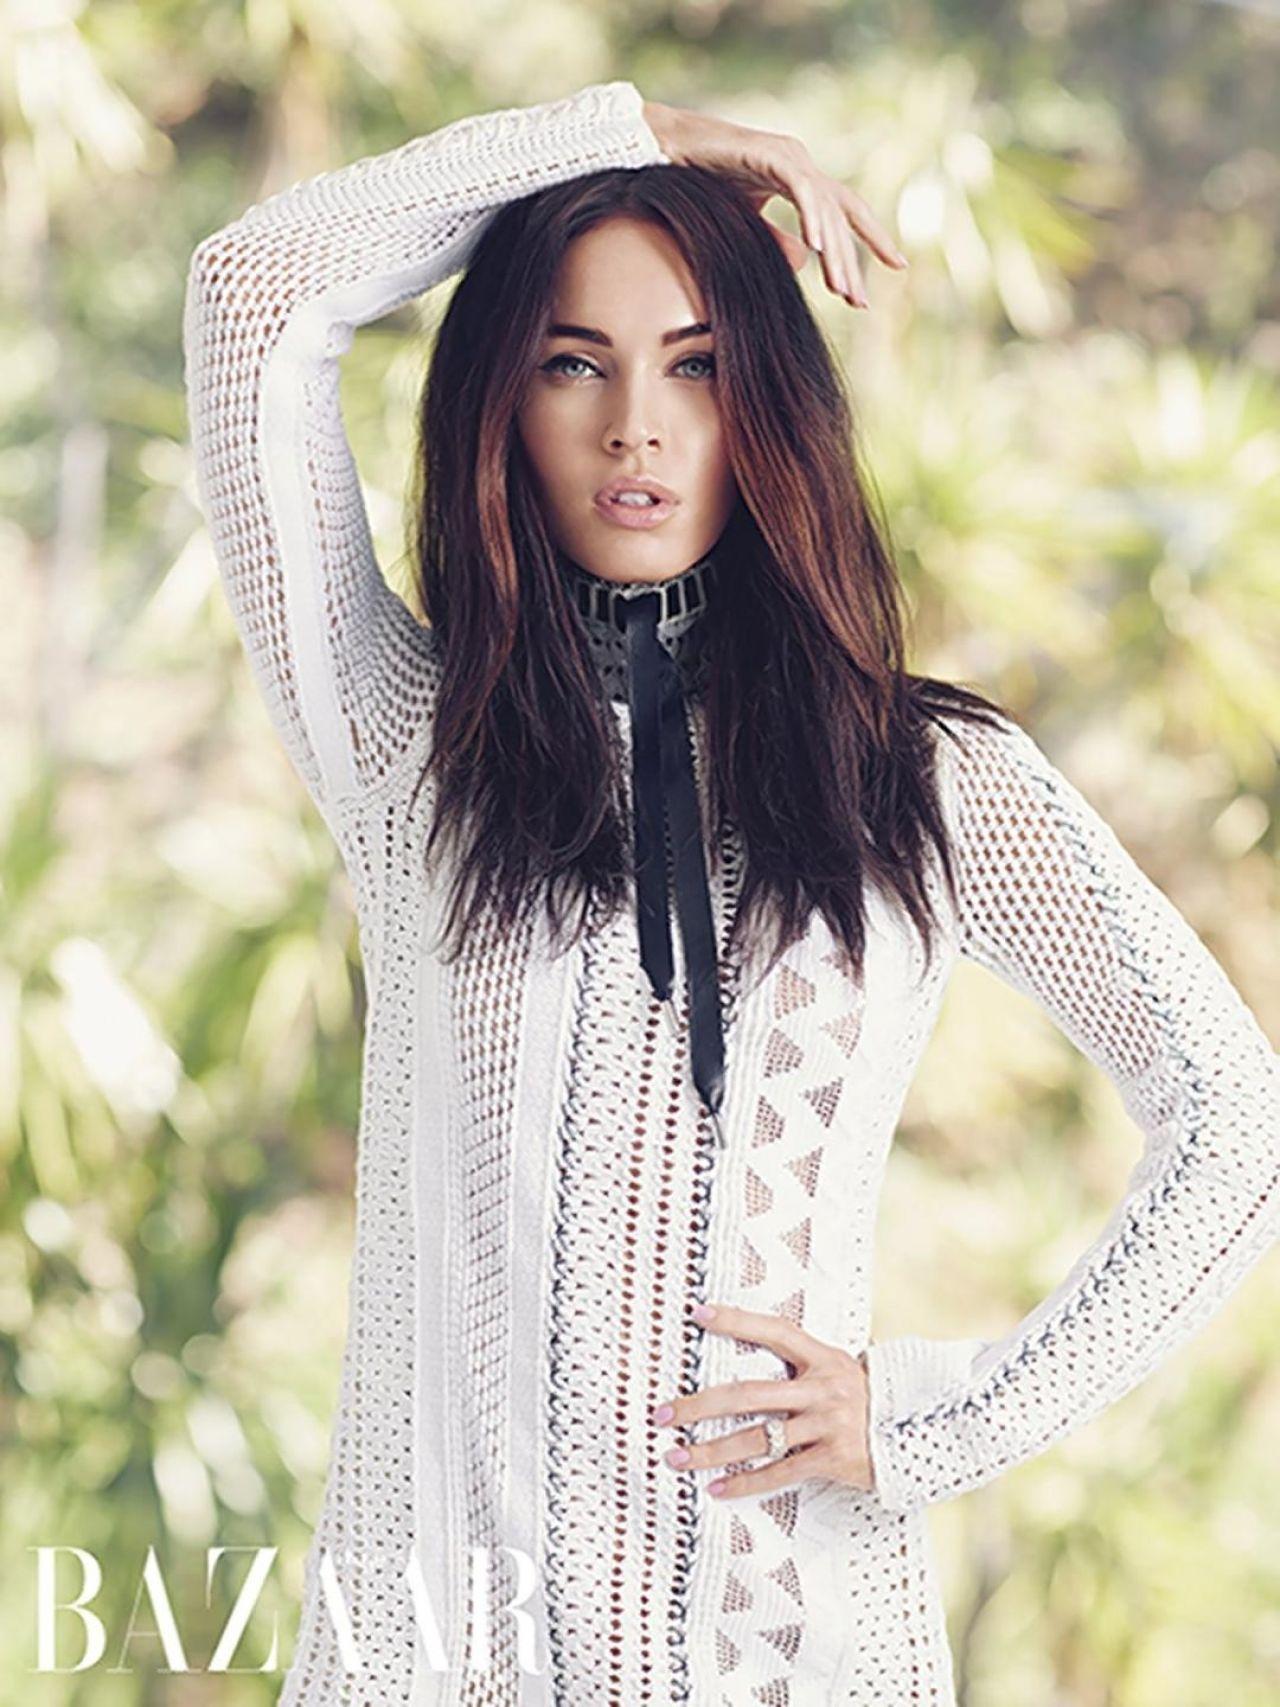 Megan Fox - Harper's Bazaar Magazine (Arabia) April 2015 Issue Megan Fox